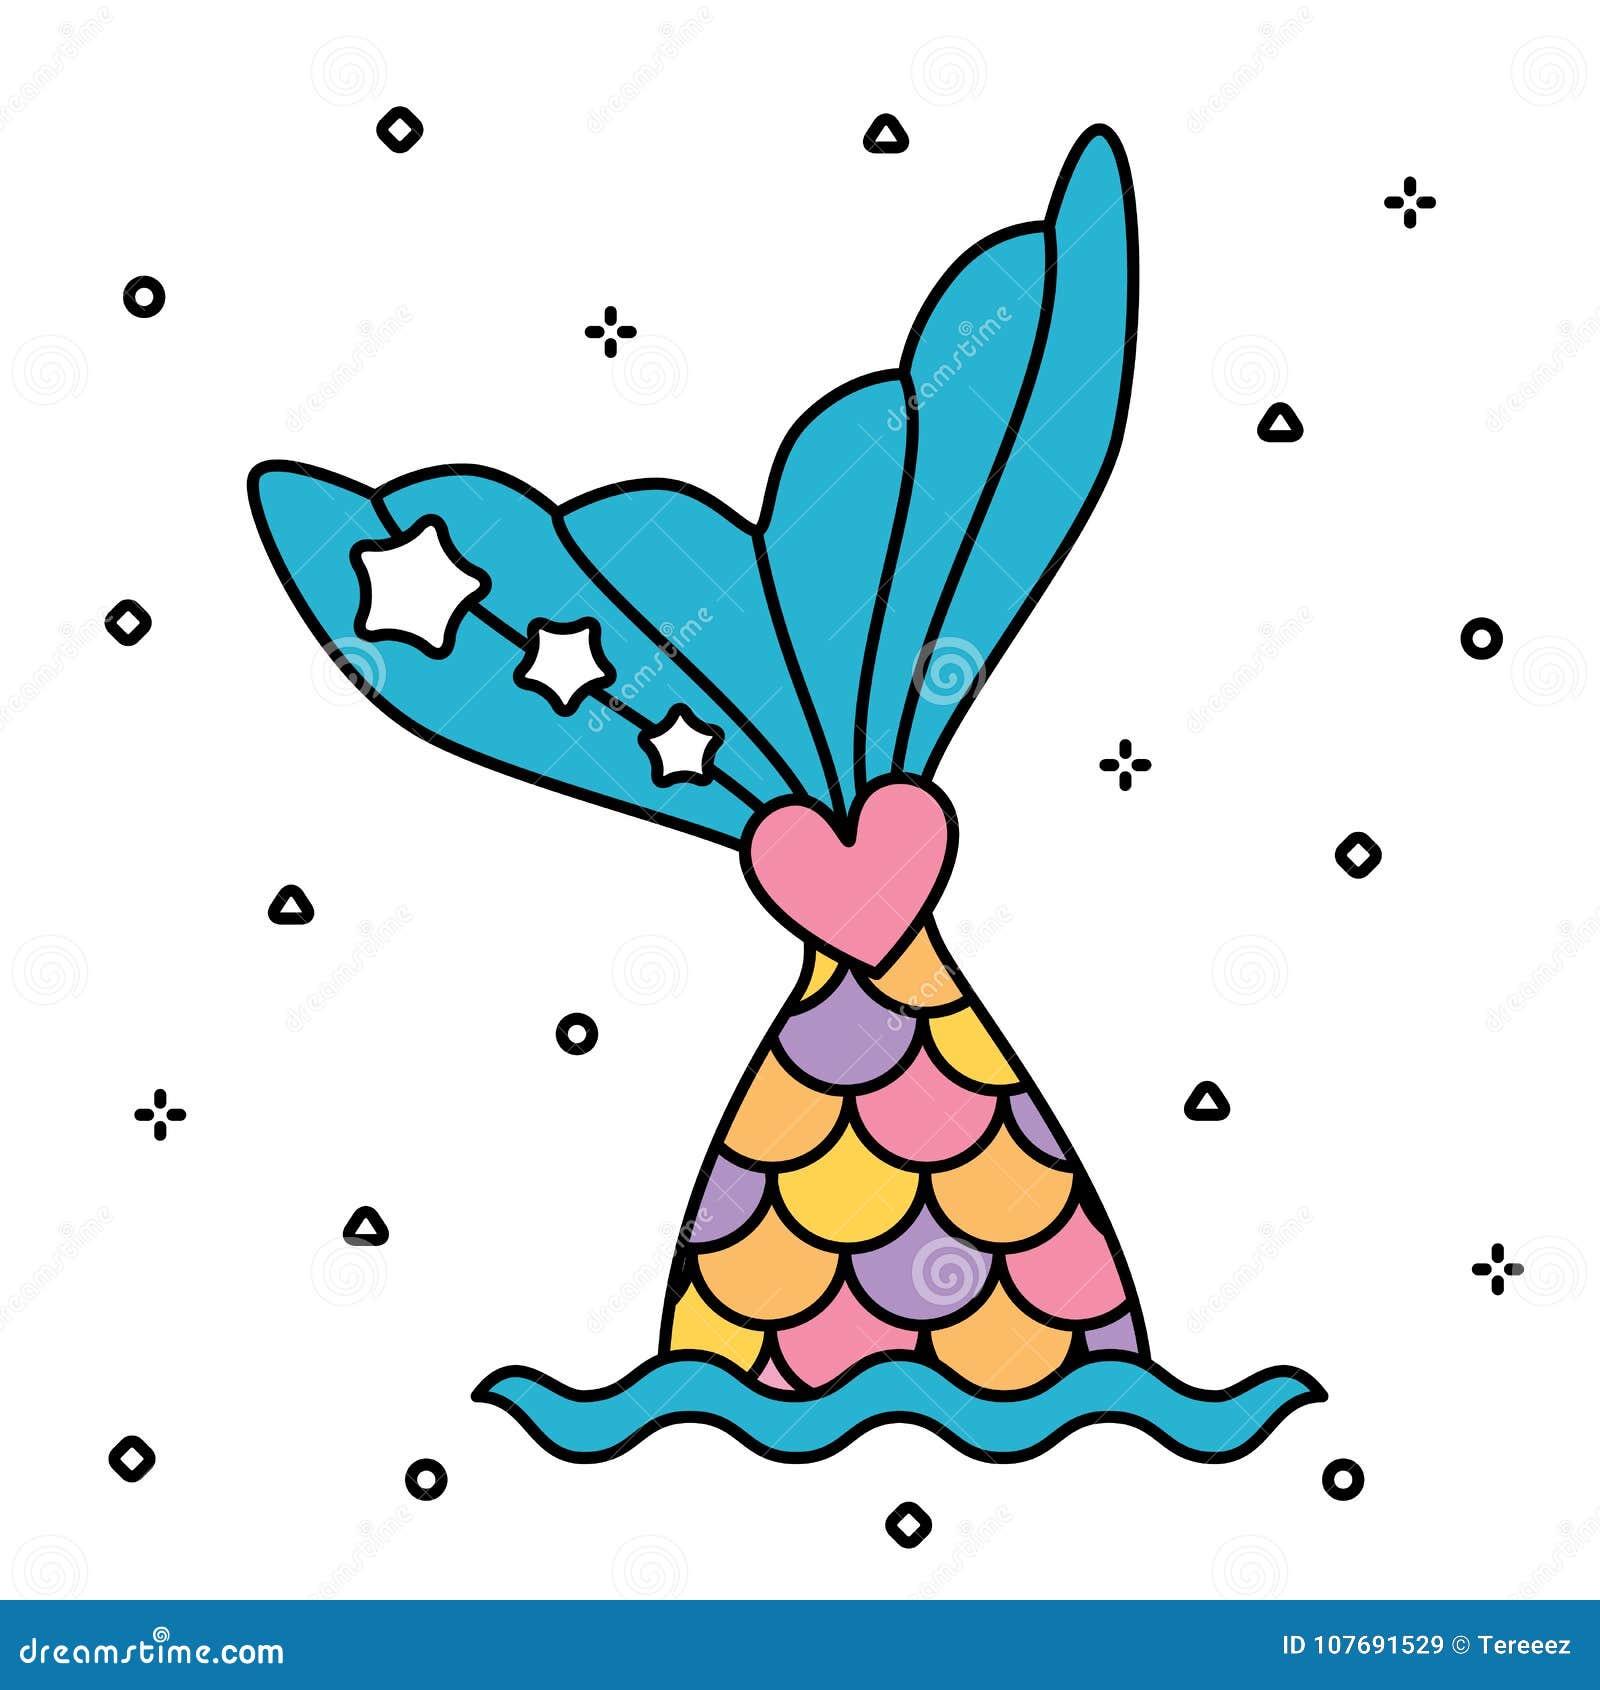 mermaid cartoons  illustrations   vector stock images rainbow fish clip art free rainbow fish clip art template